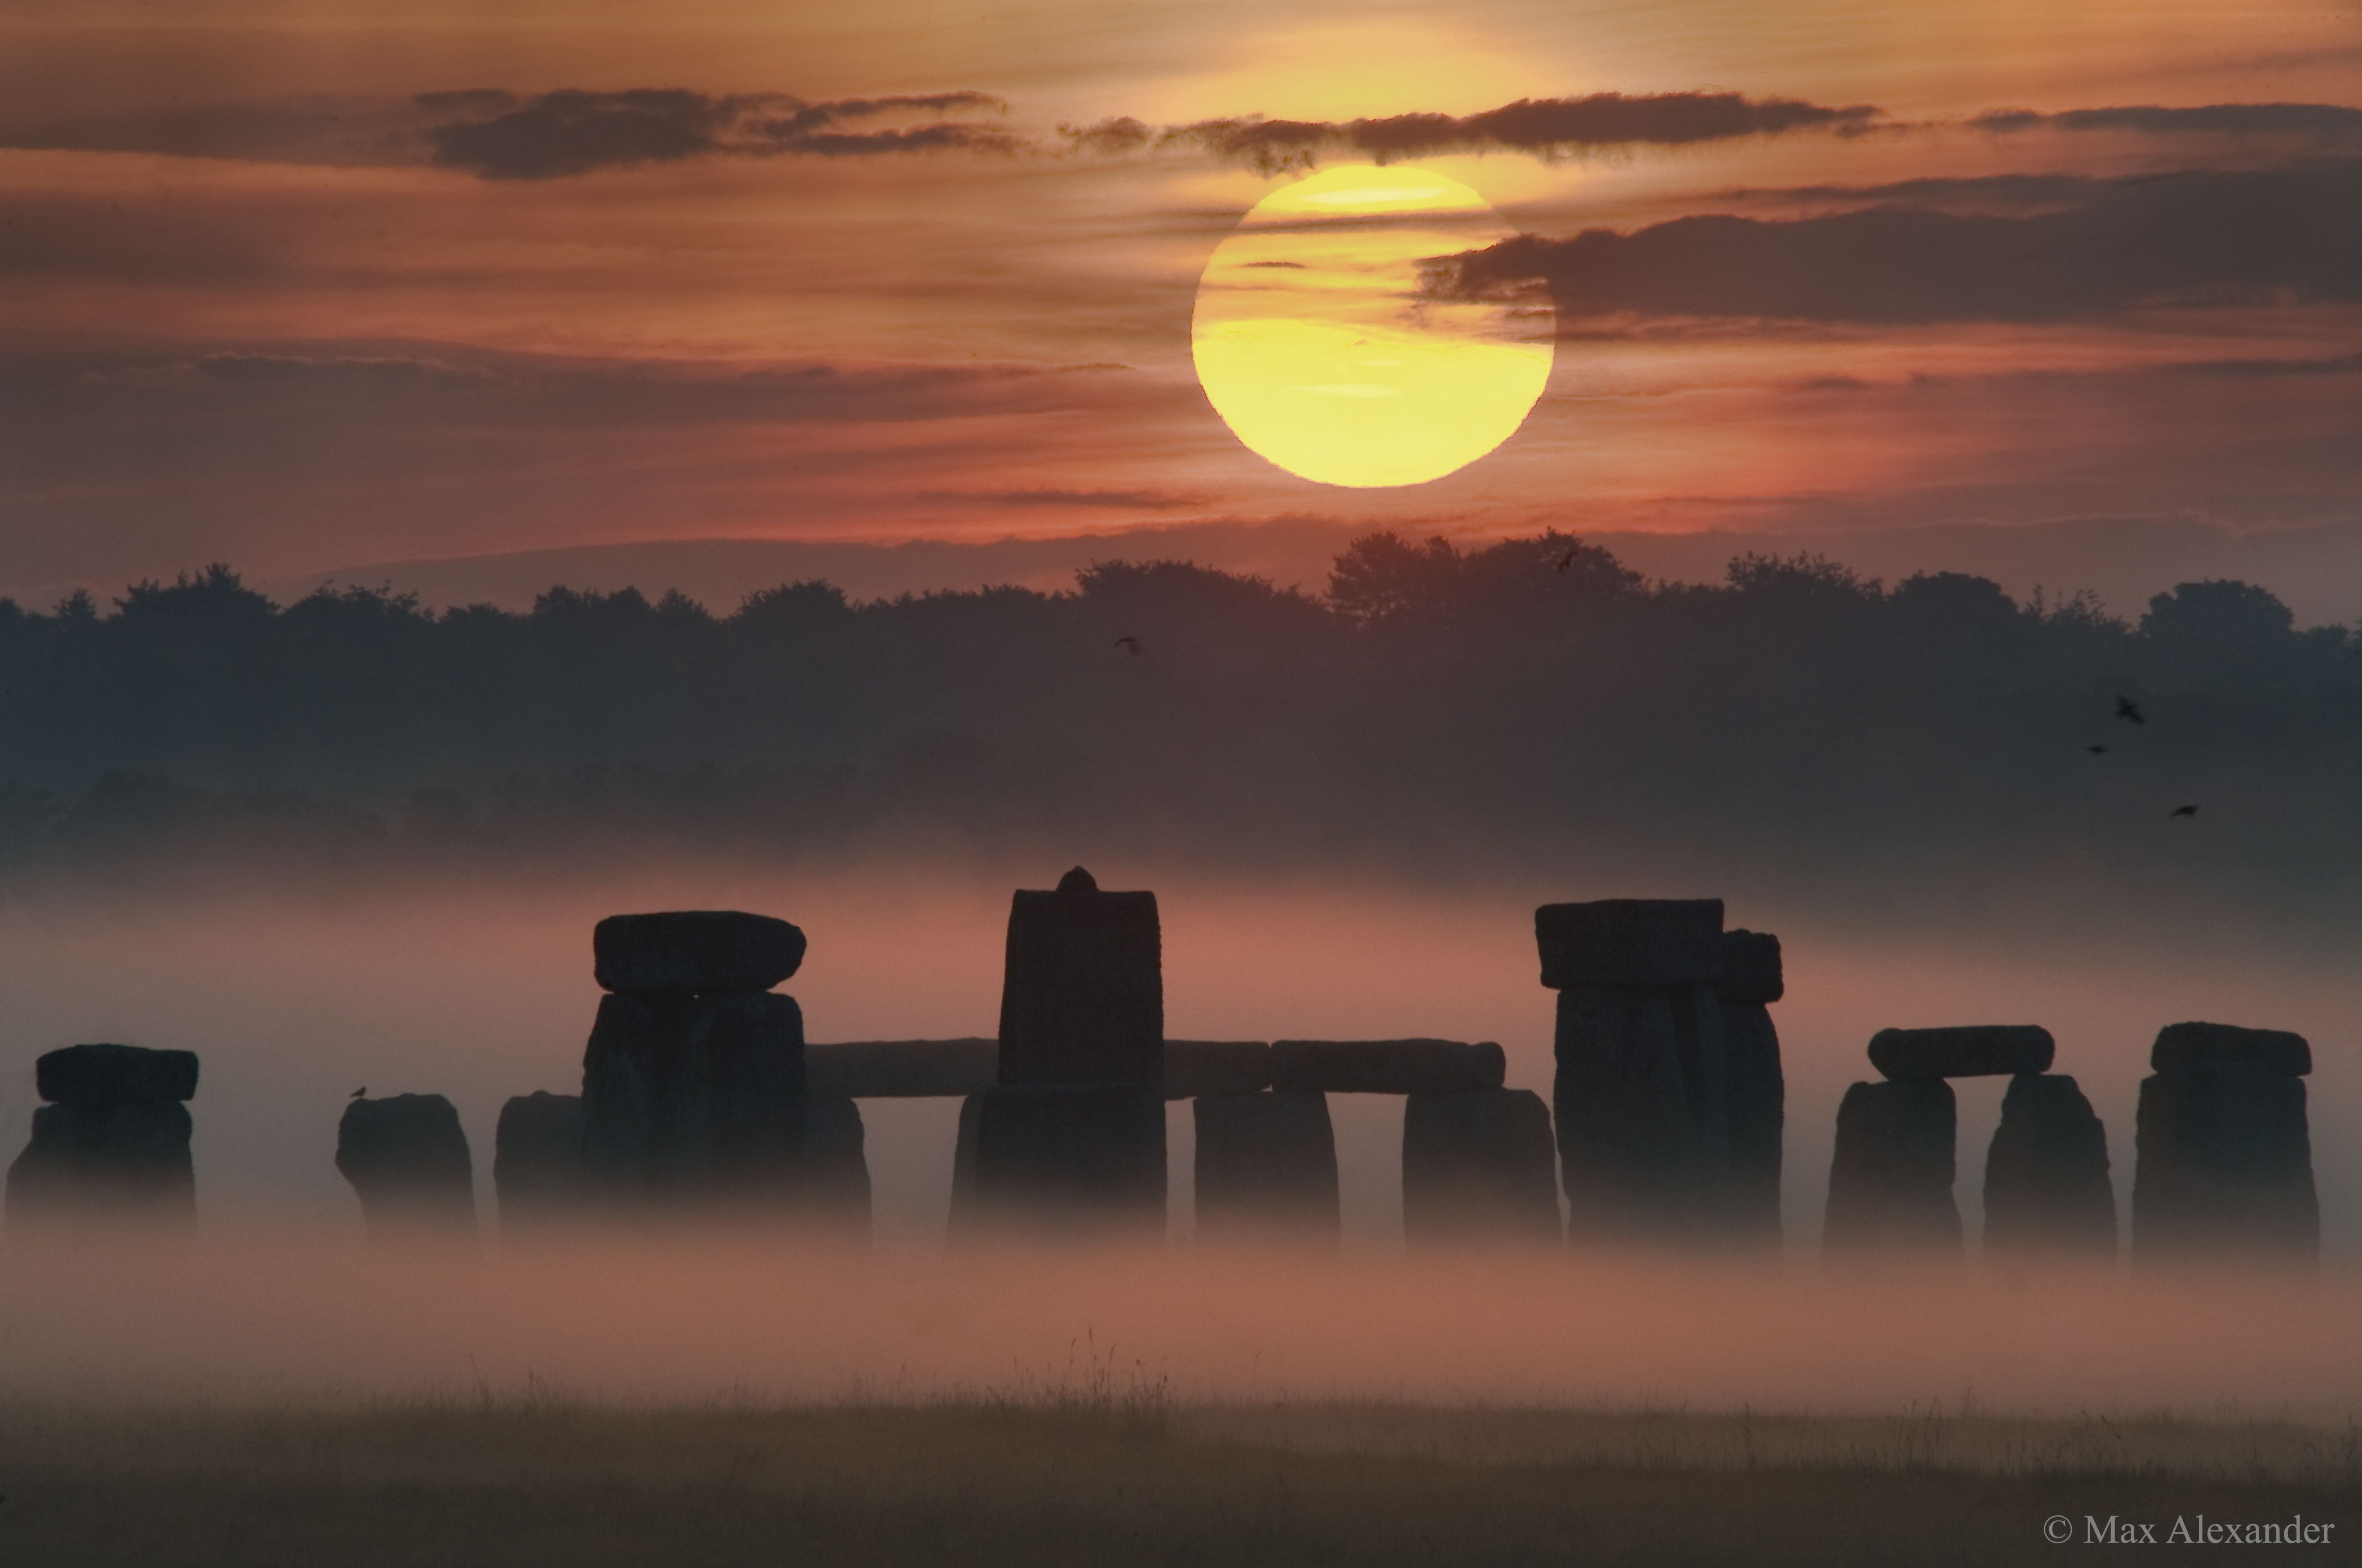 APOD: 2016 June 20 - Sunrise Solstice over Stonehenge